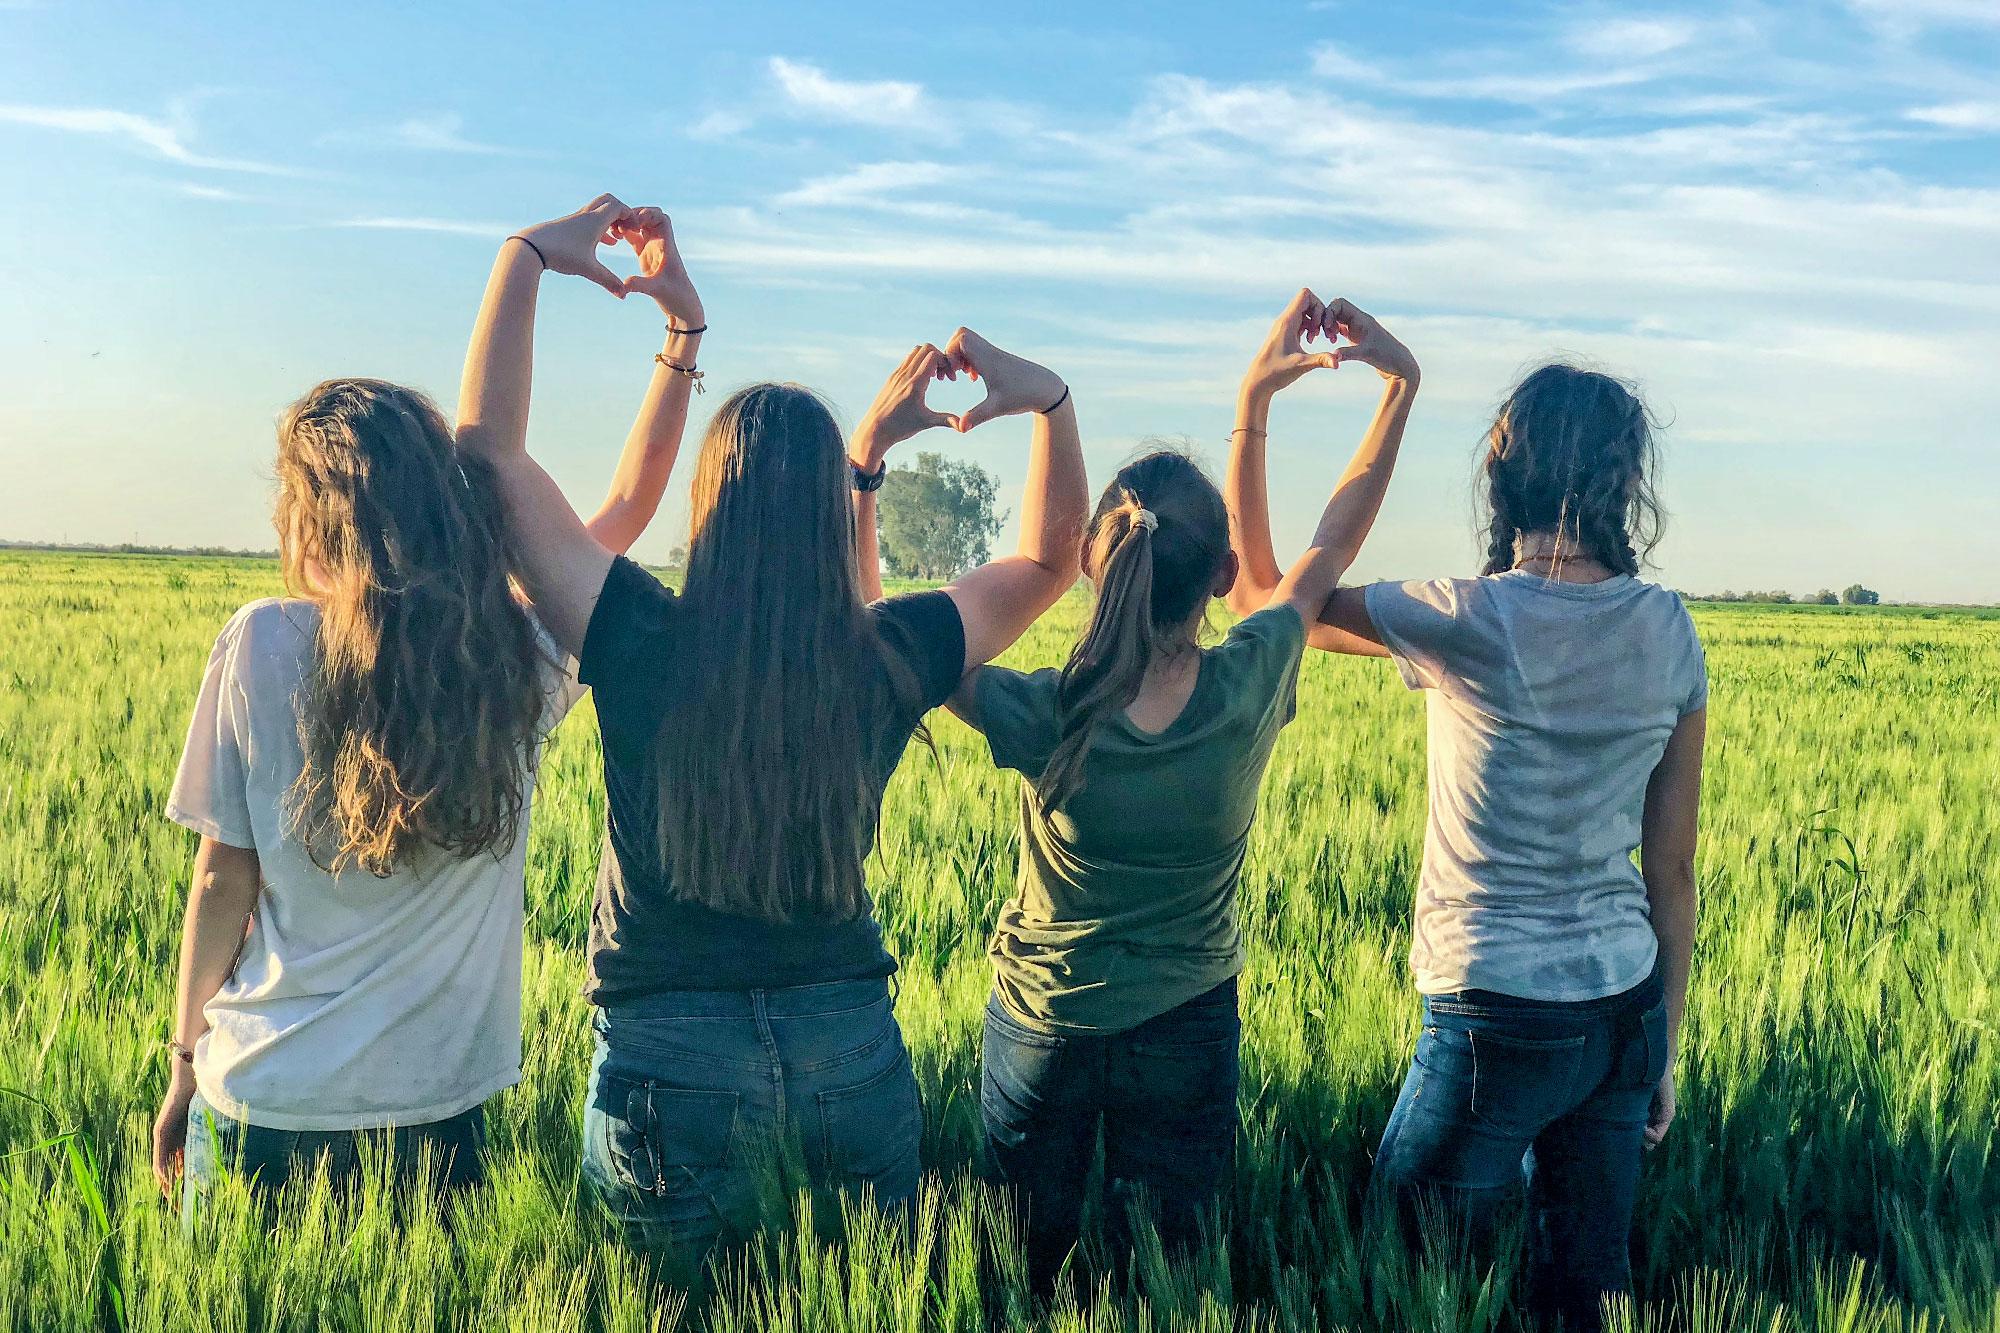 Escapada con amigos en grupo